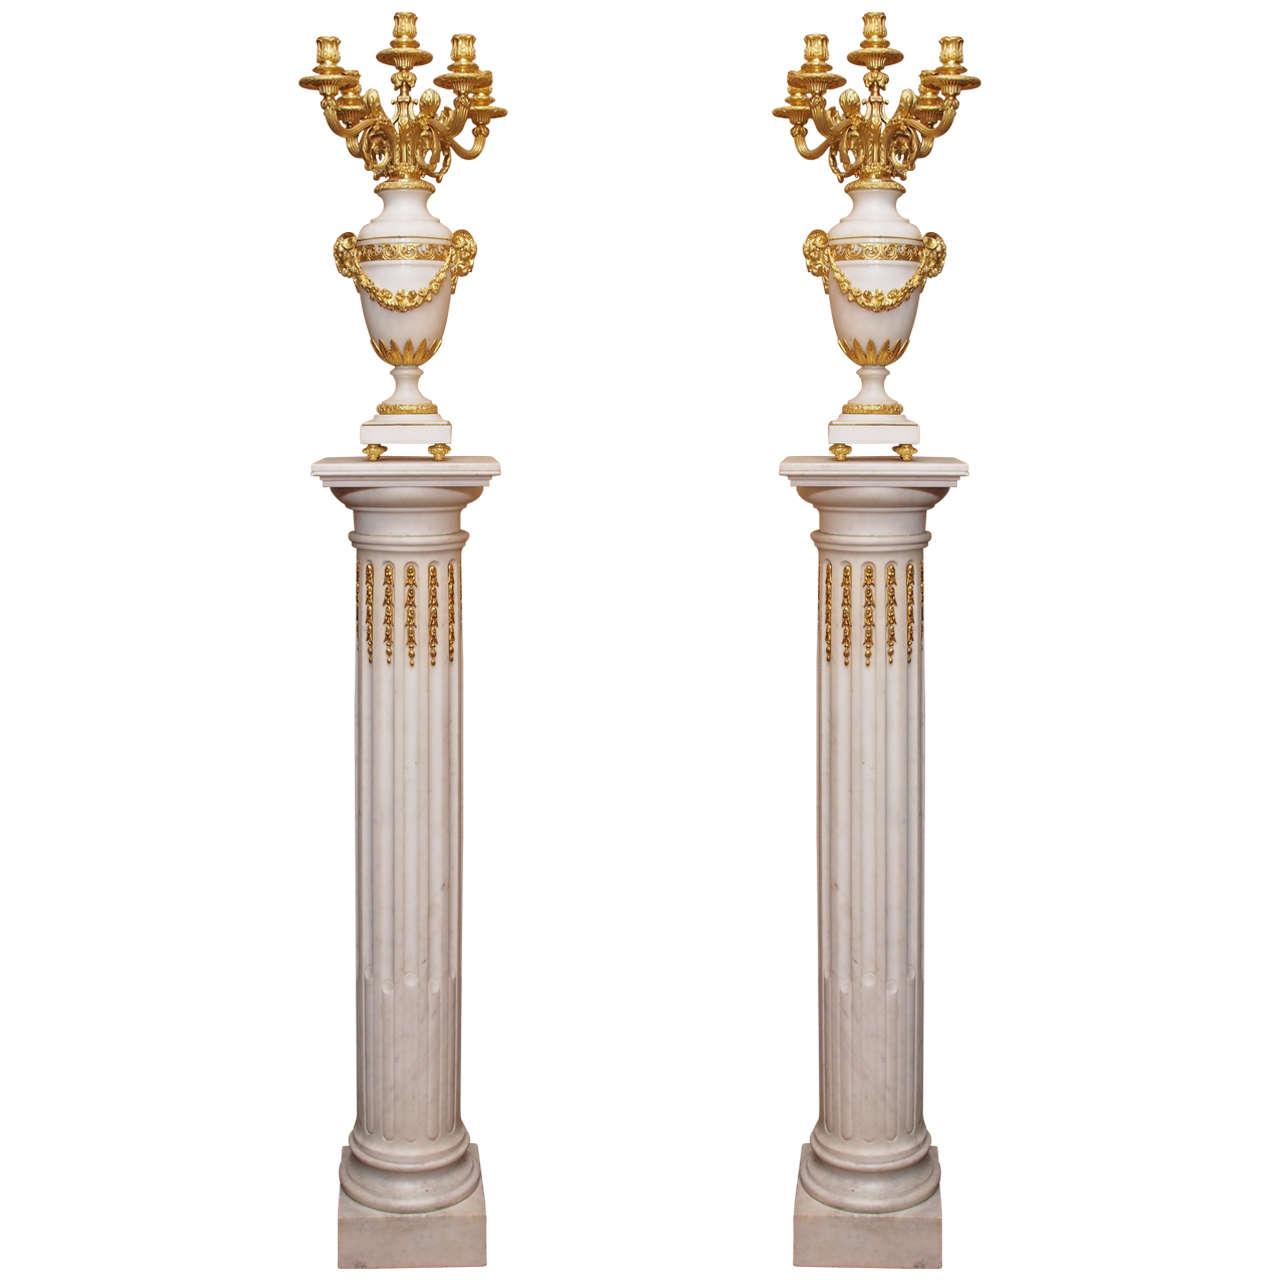 Pair Of Antique Carrara Marble And Ormolu Pedestals And